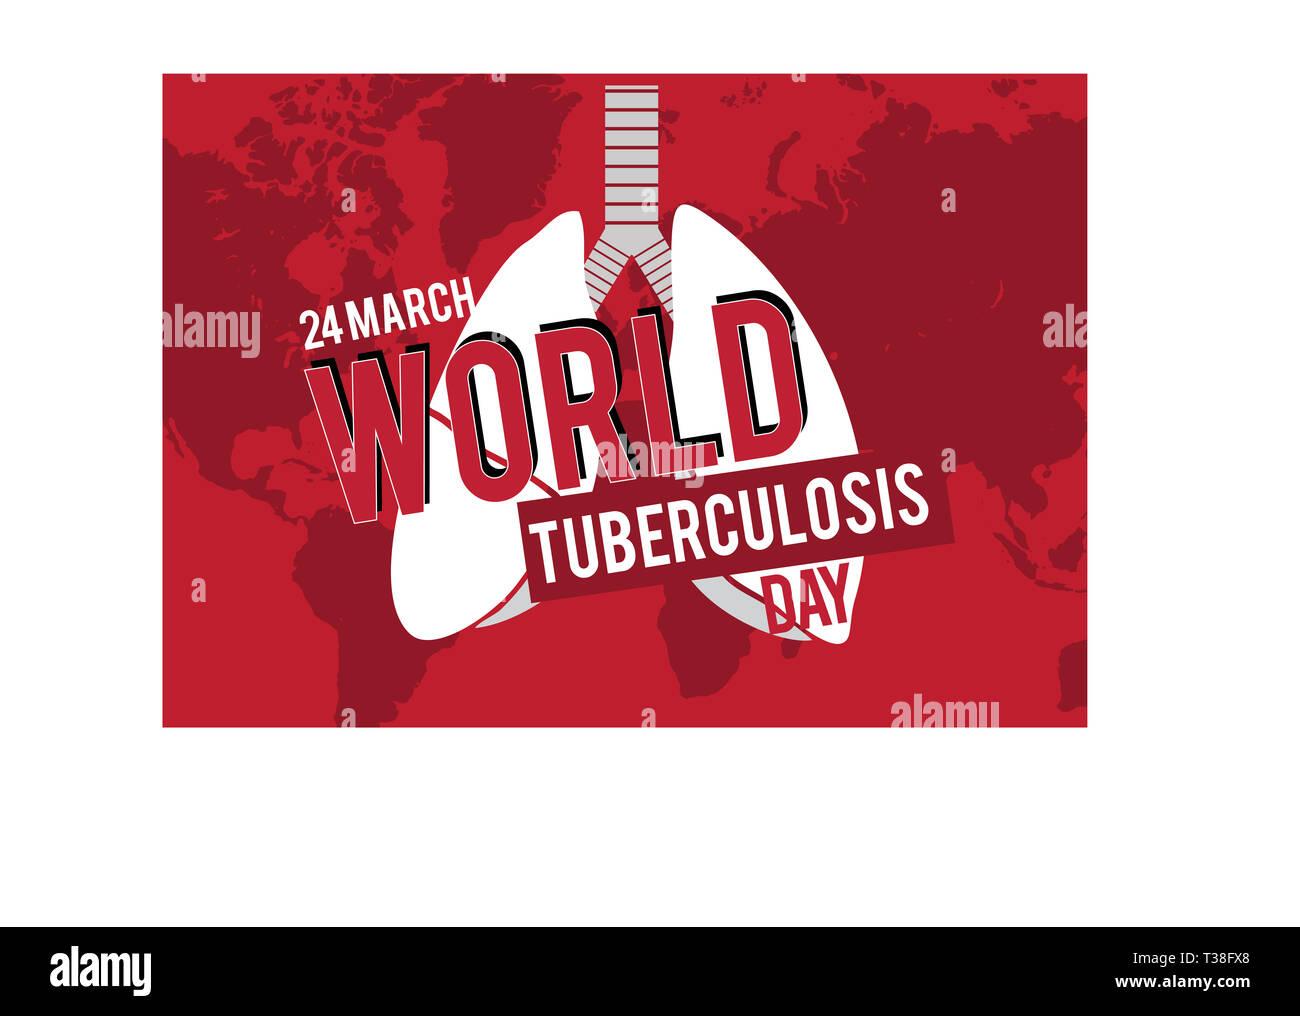 Mar_24_World Tuberculosis Day -2 - Stock Image